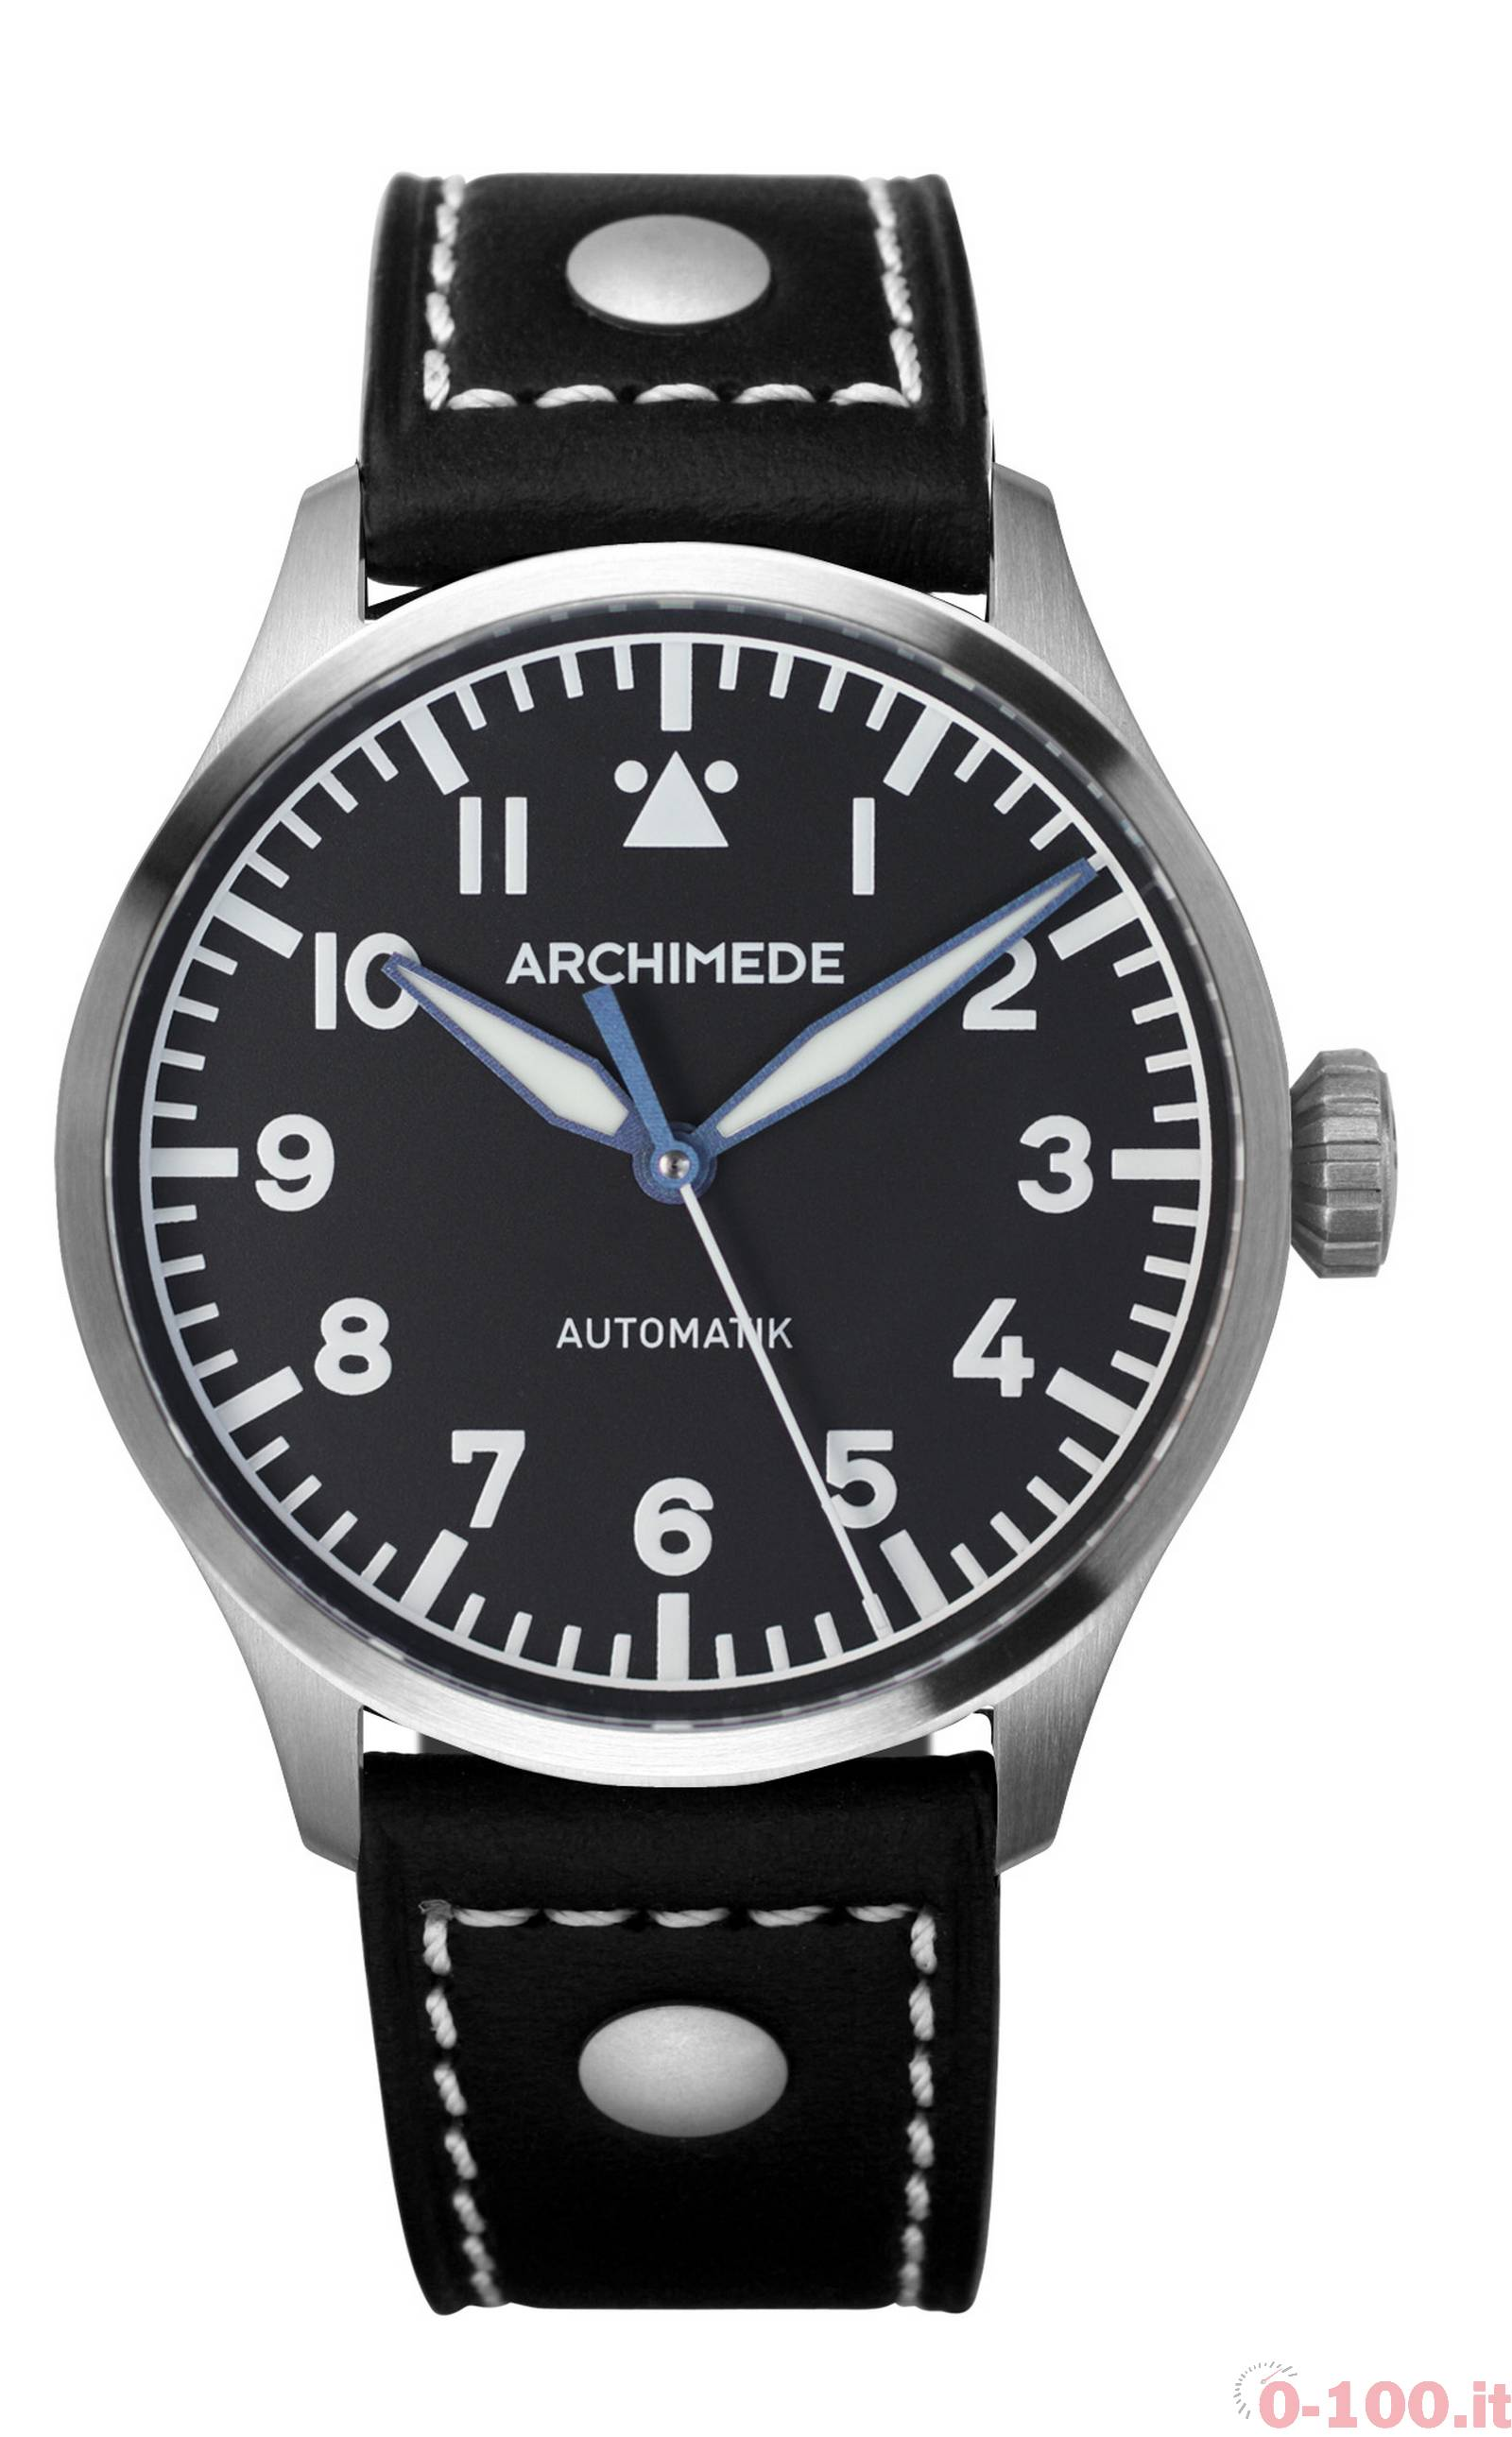 archimede_pilot_36_0-100_8